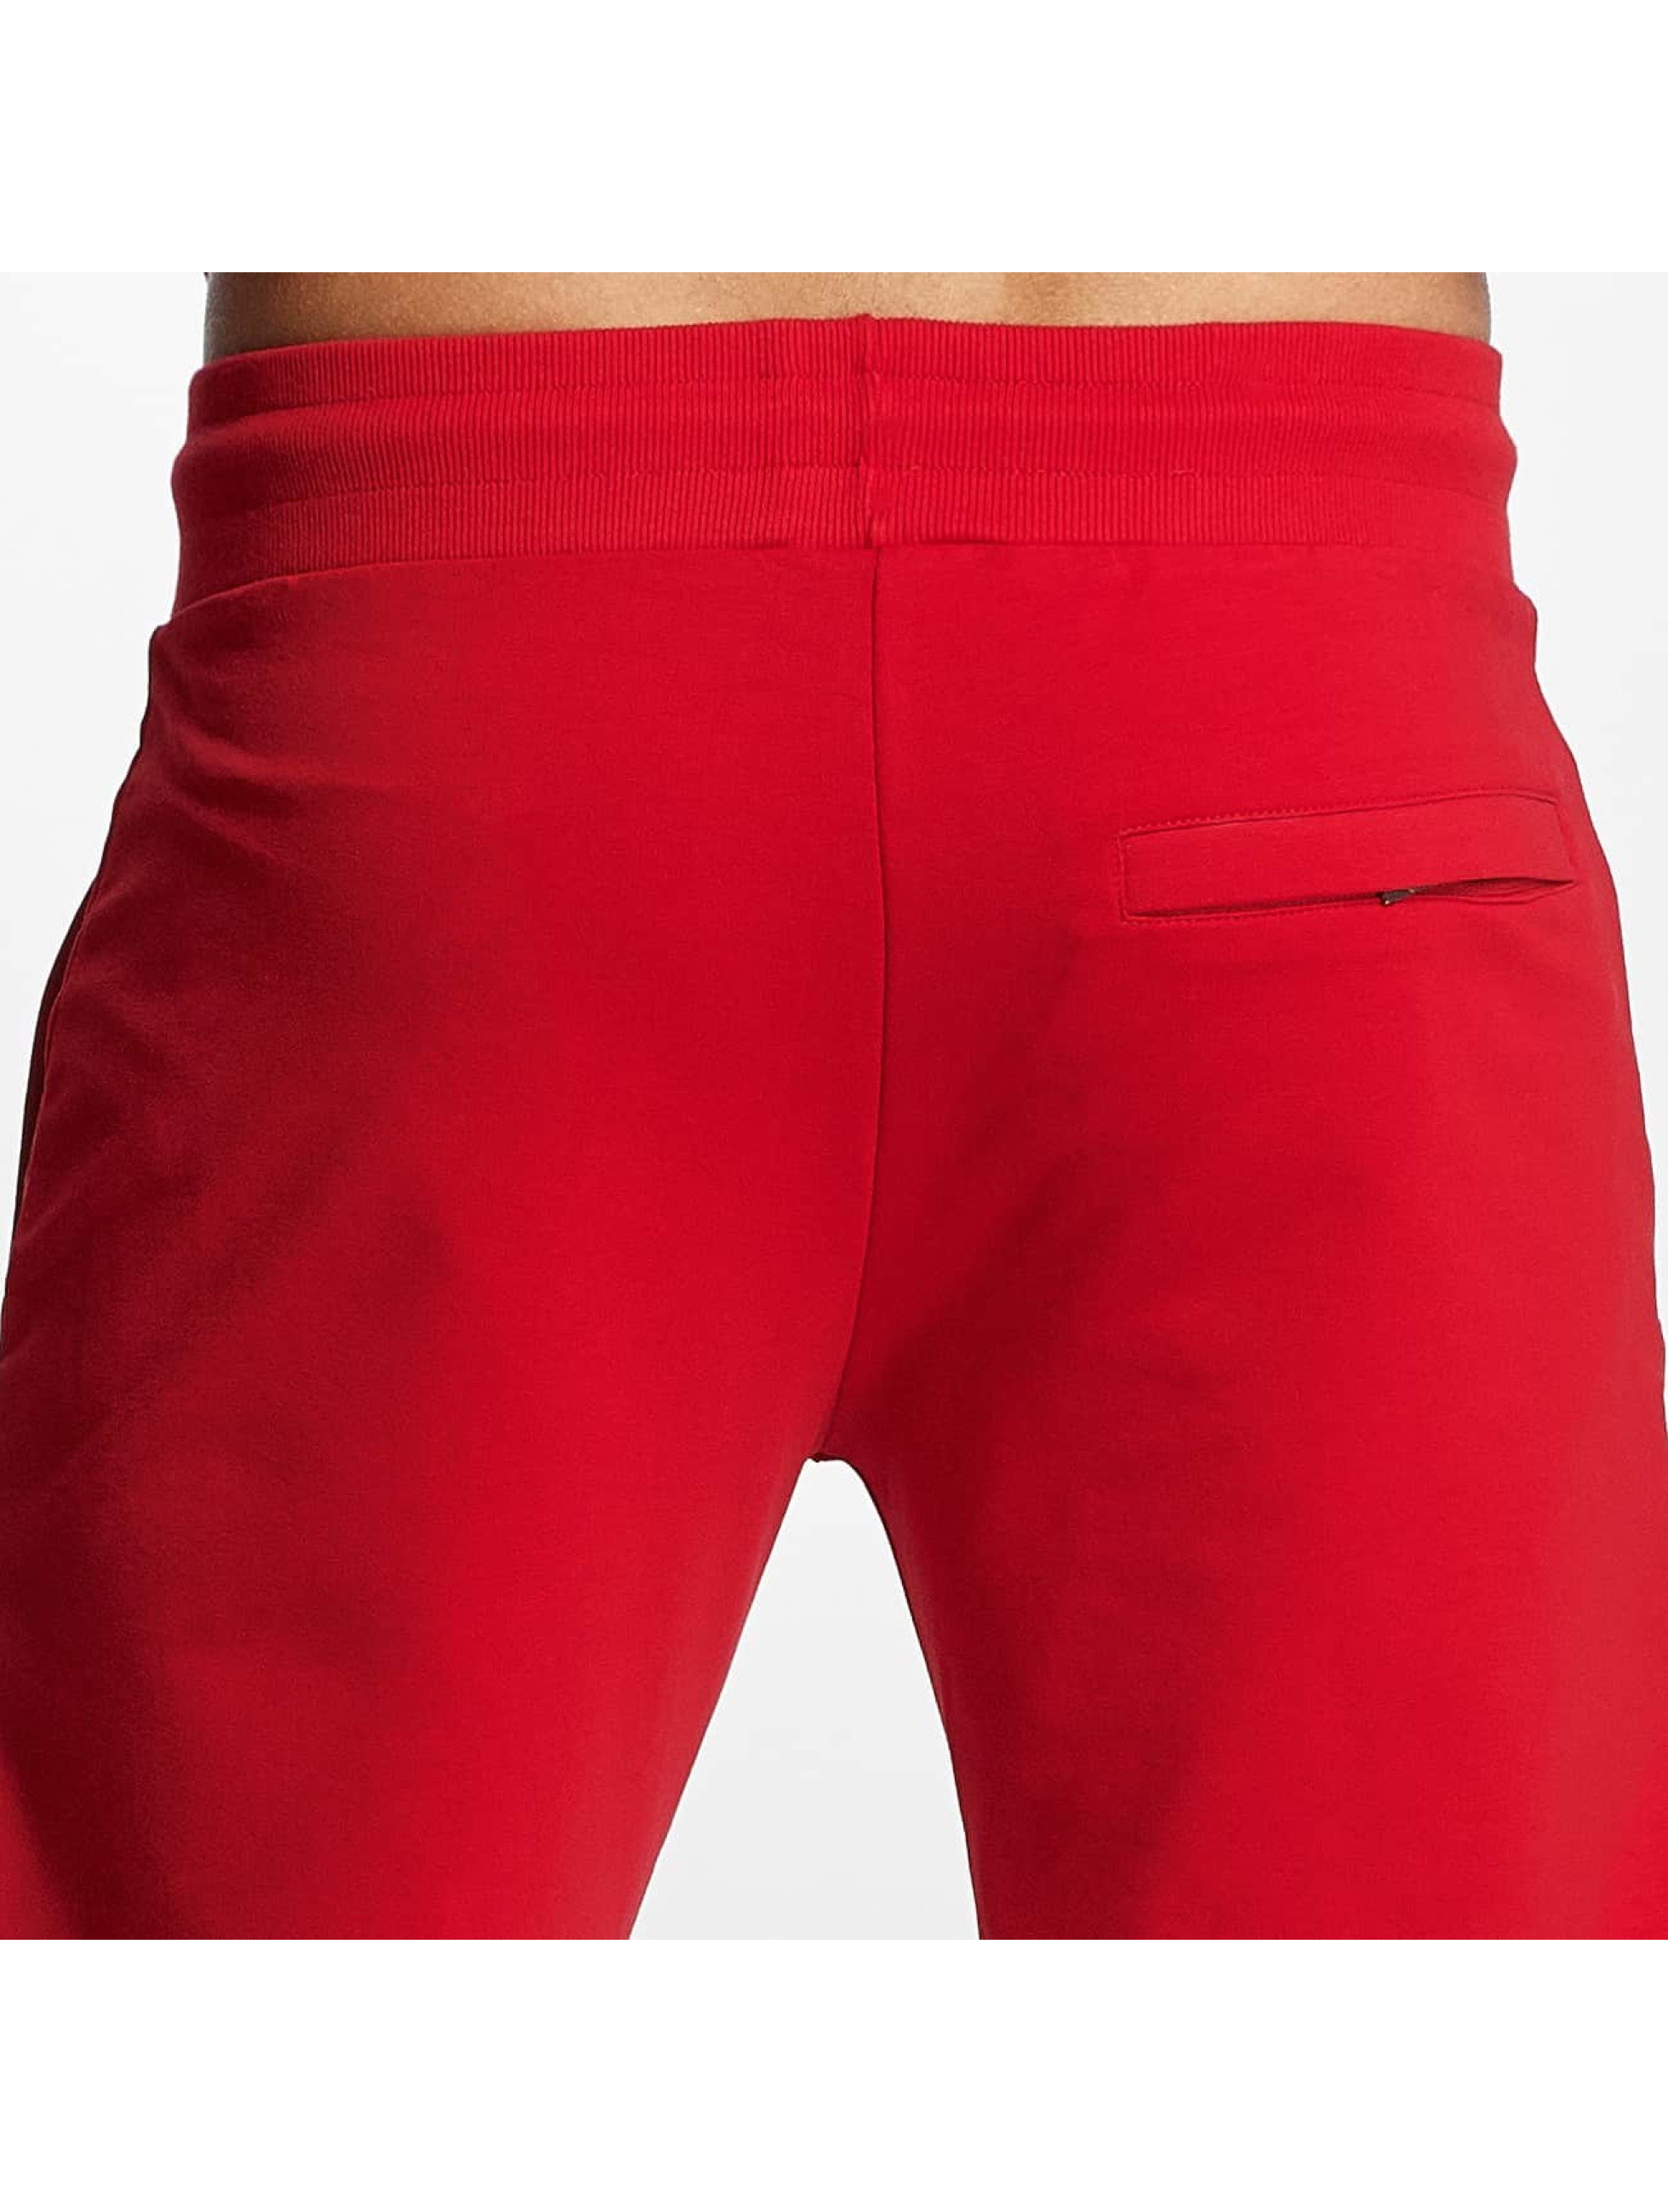 Pro Violence Streetwear Trainingspak Cosy rood